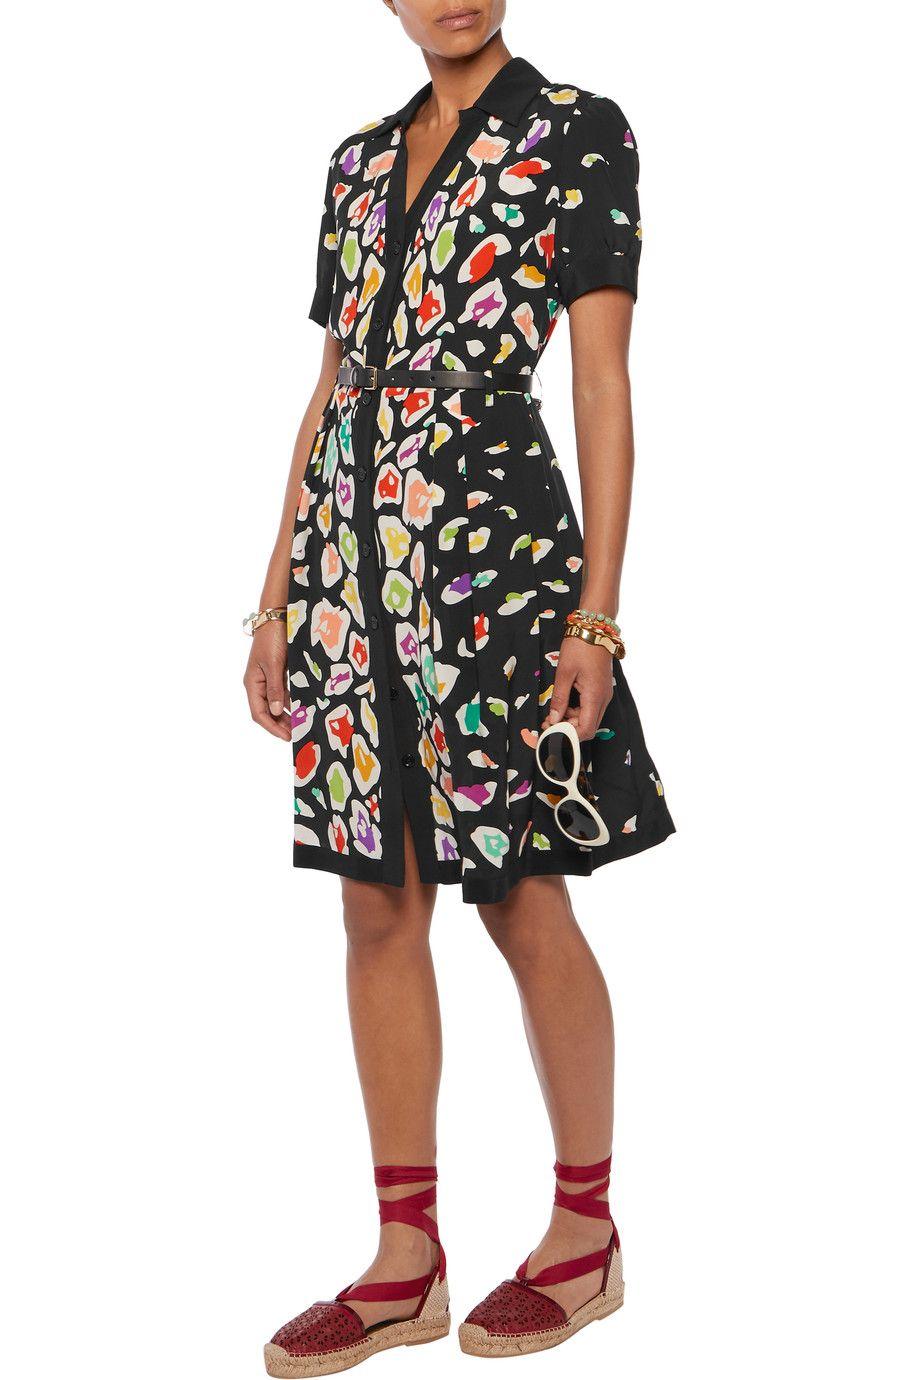 Dress by Missoni Resort 2015